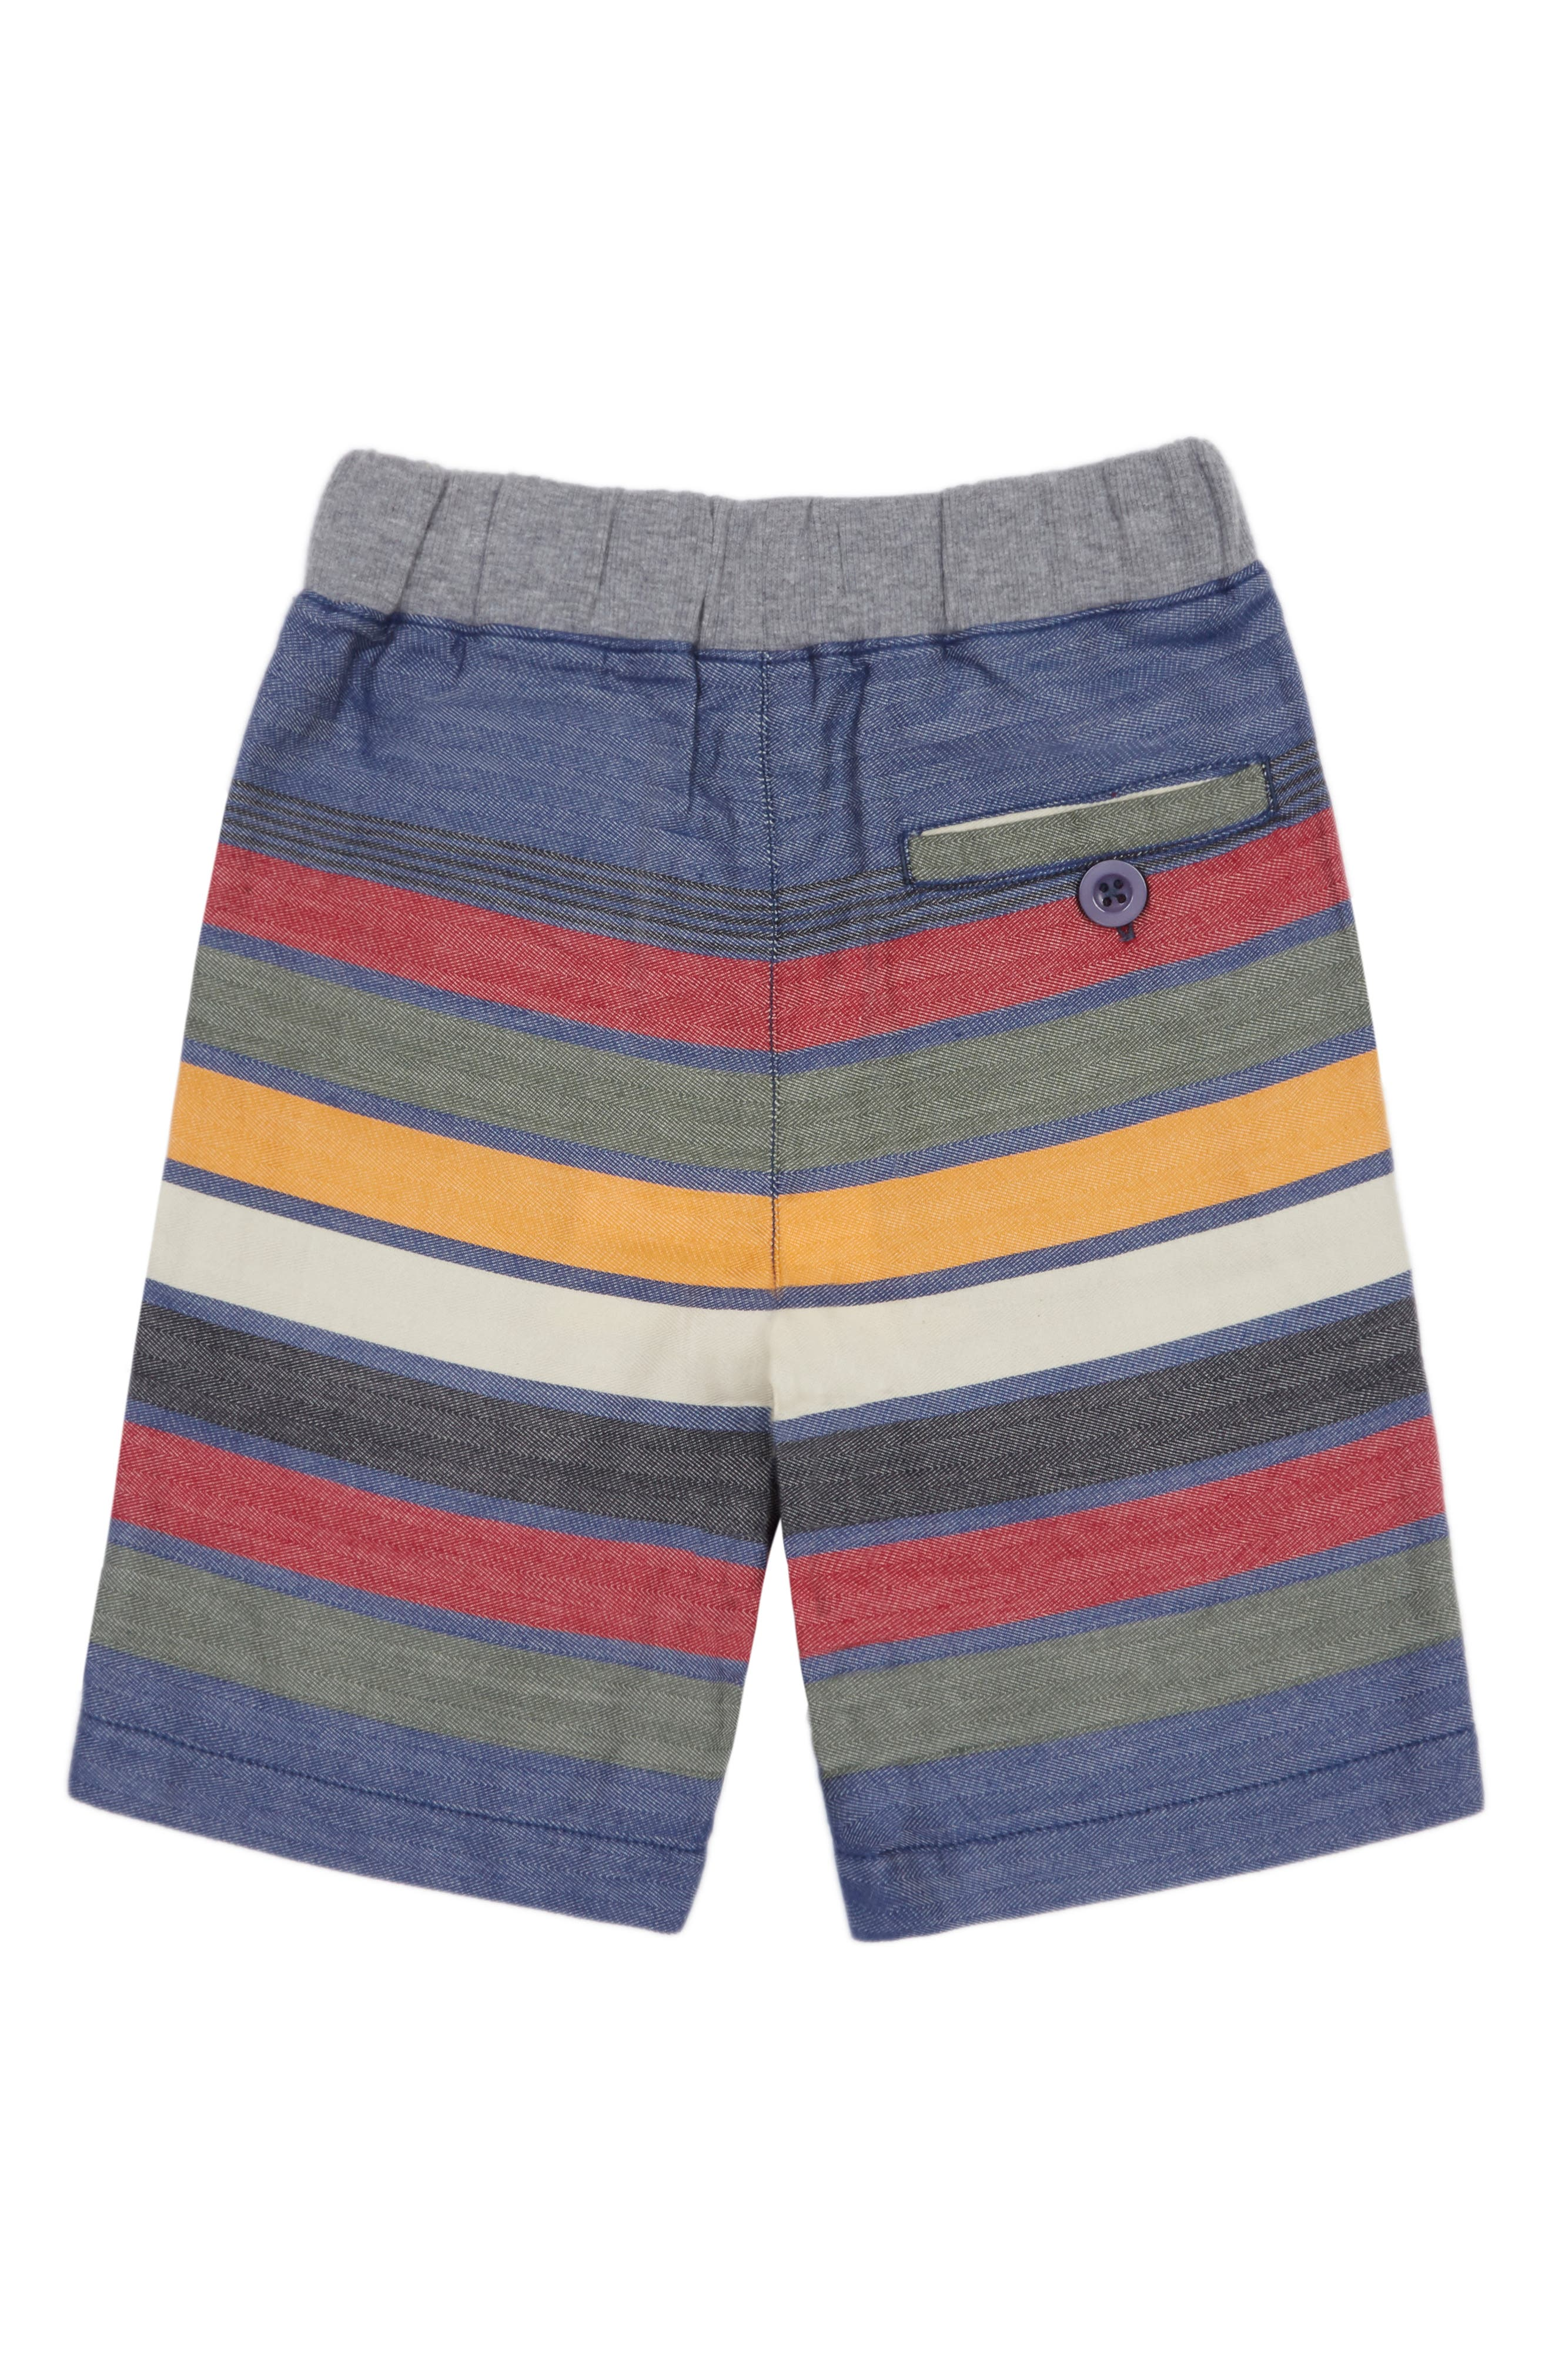 Peek Noah Striped Knit Pull-On Shorts